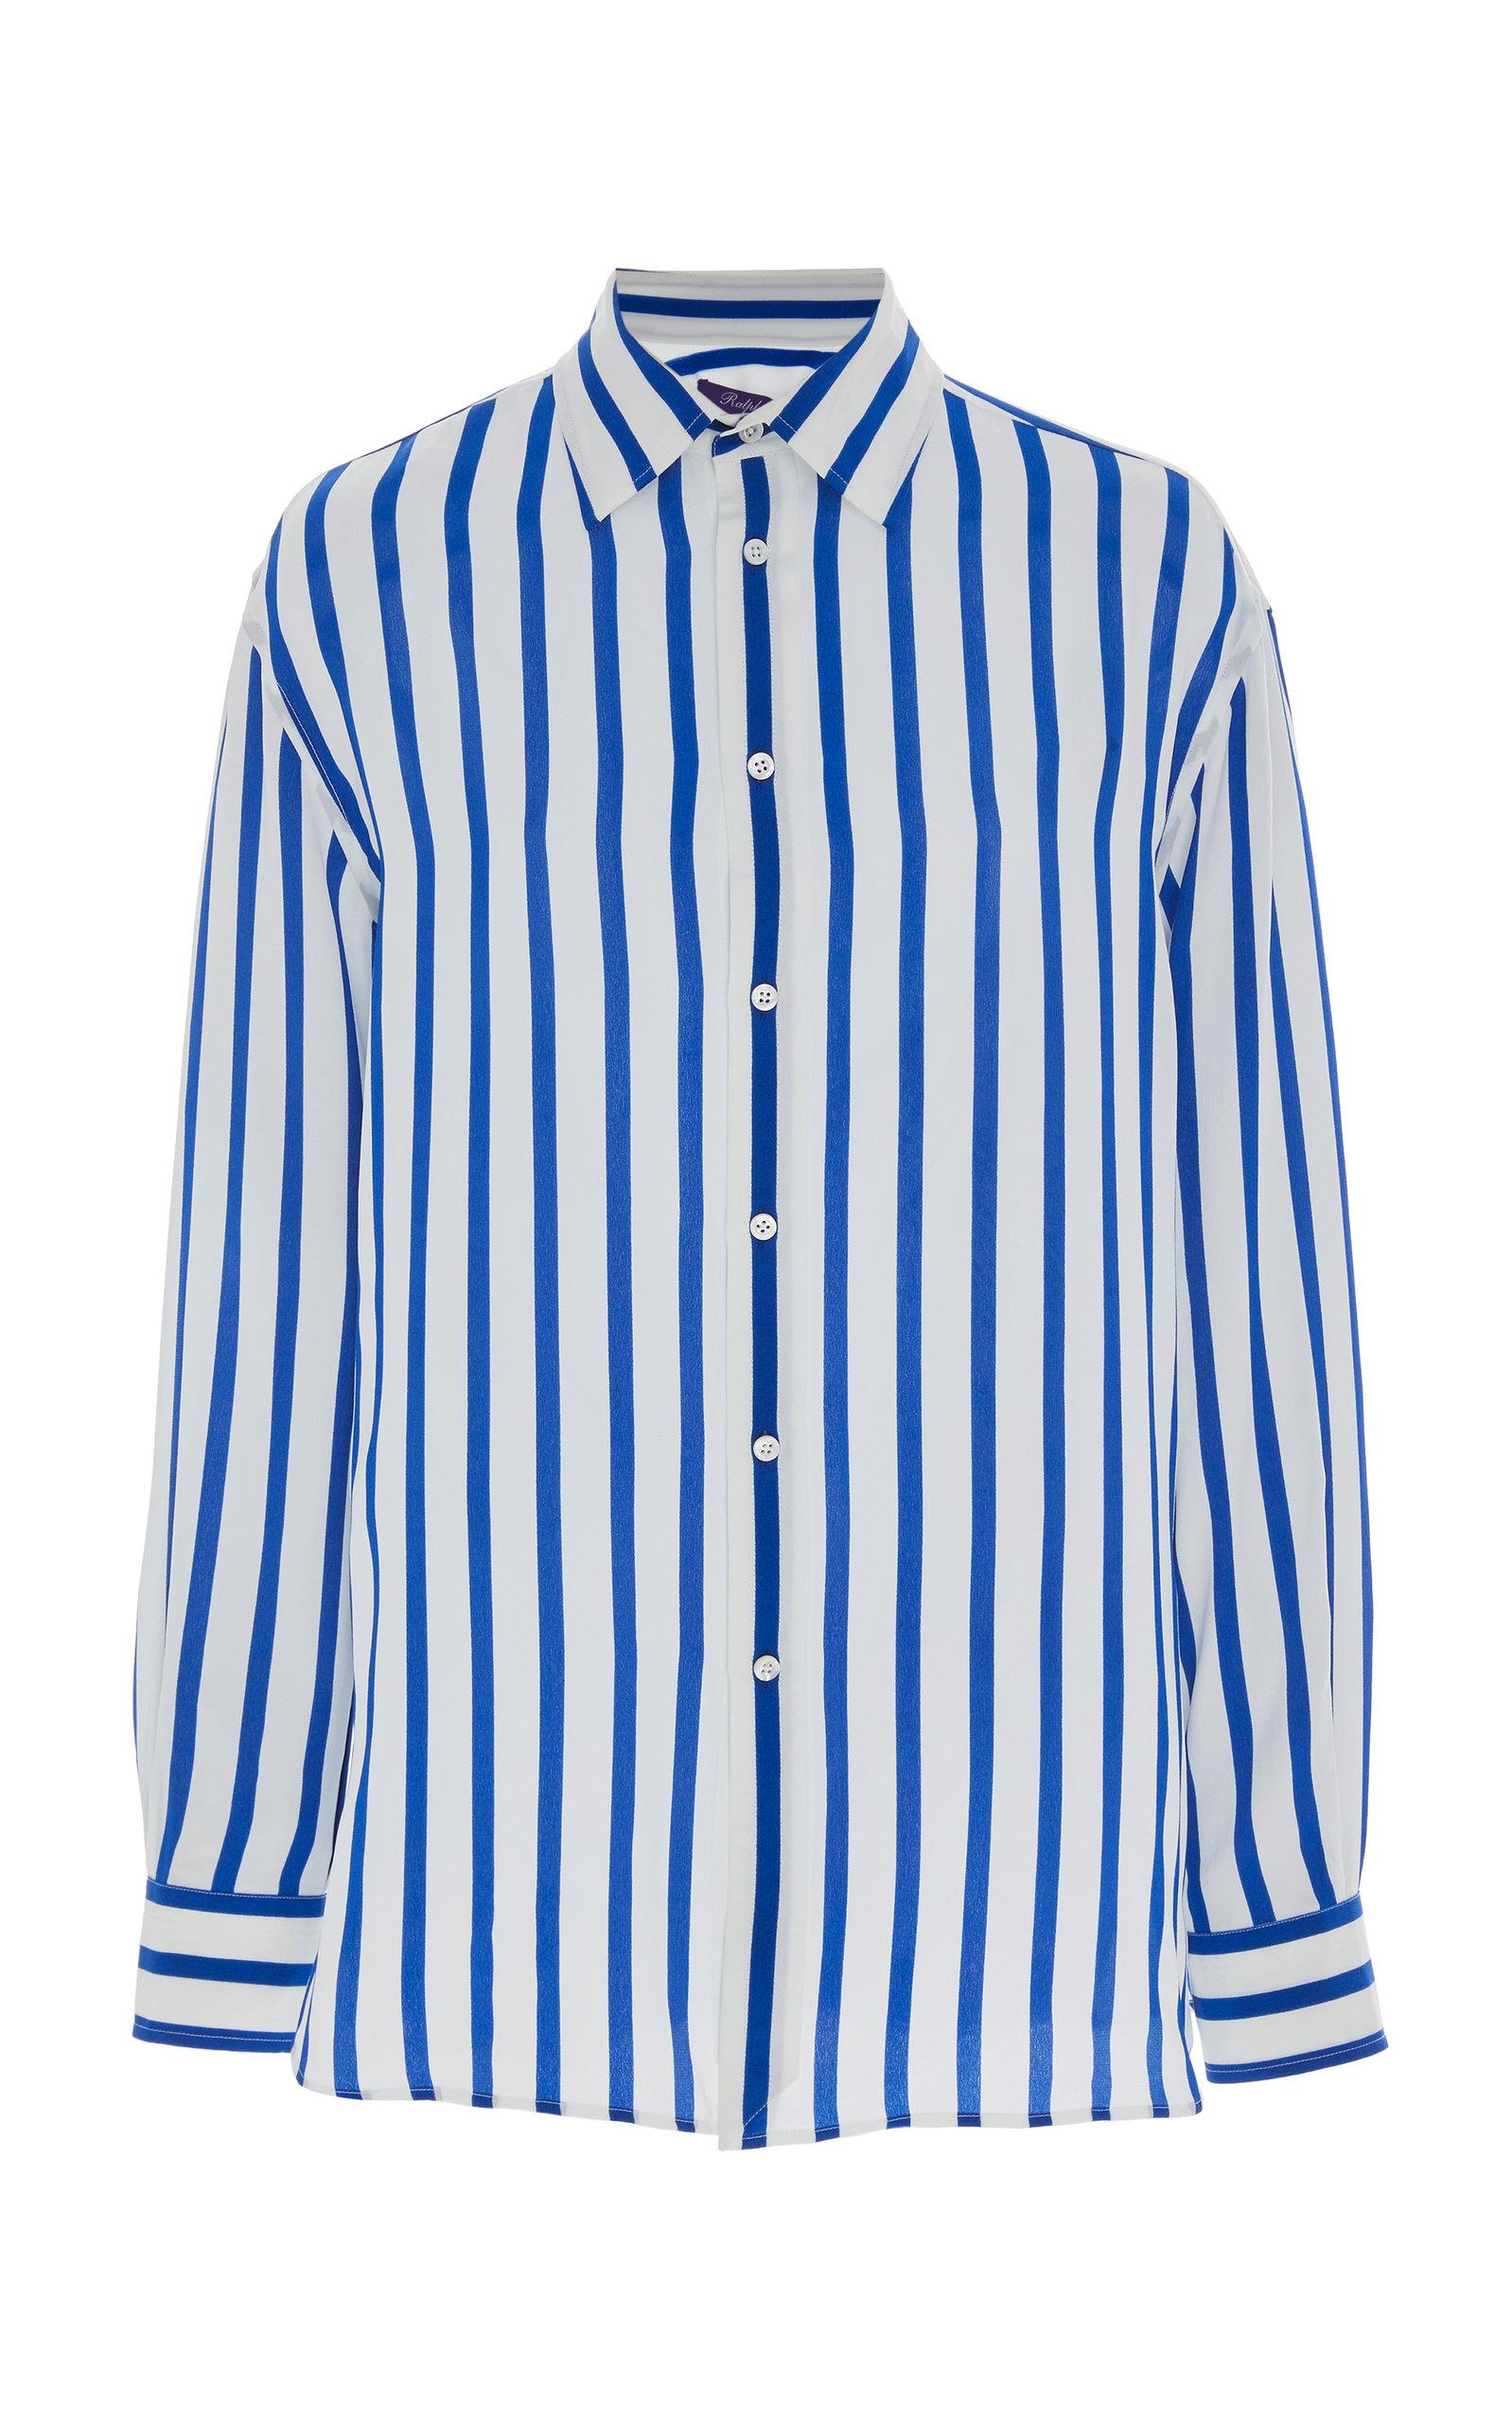 43cea290ab4 Ralph Lauren Adrien Silk Striped Shirt